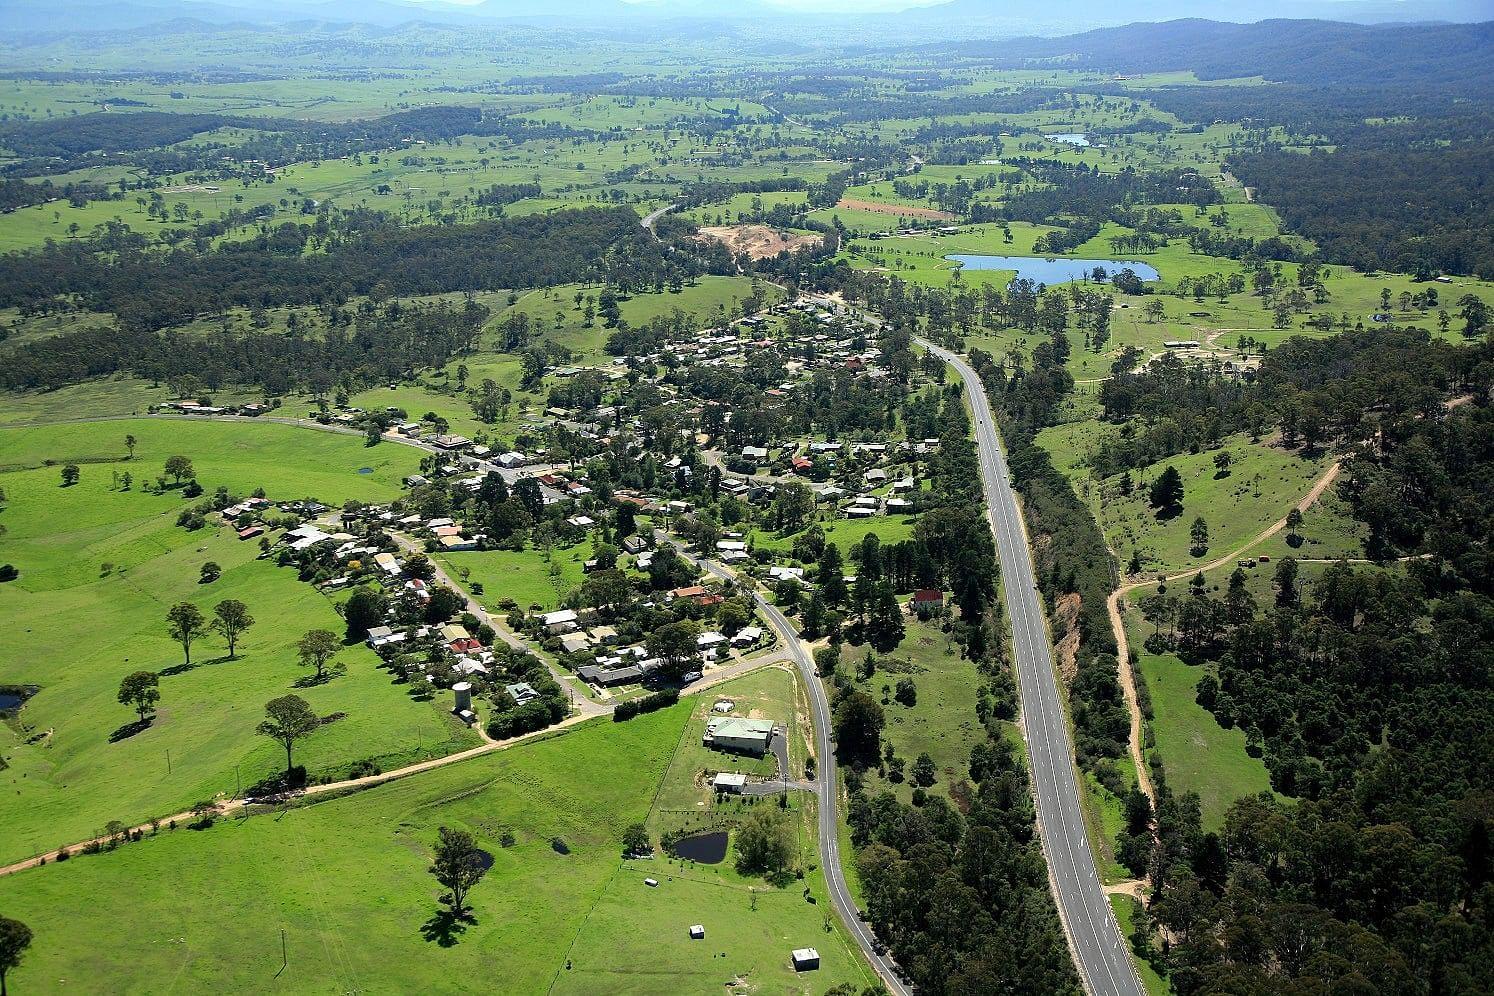 Aerial photo of Wolumla.